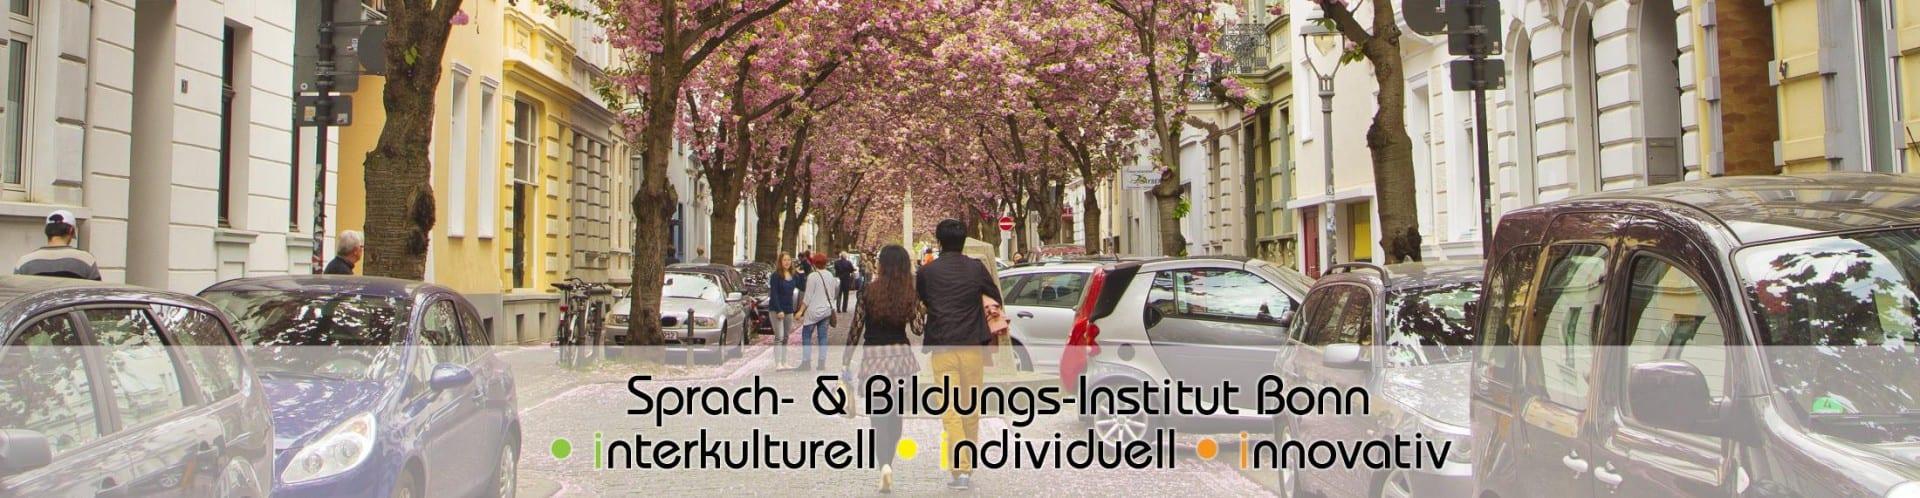 bonn-blueten-paar2-sprachschule-bonn